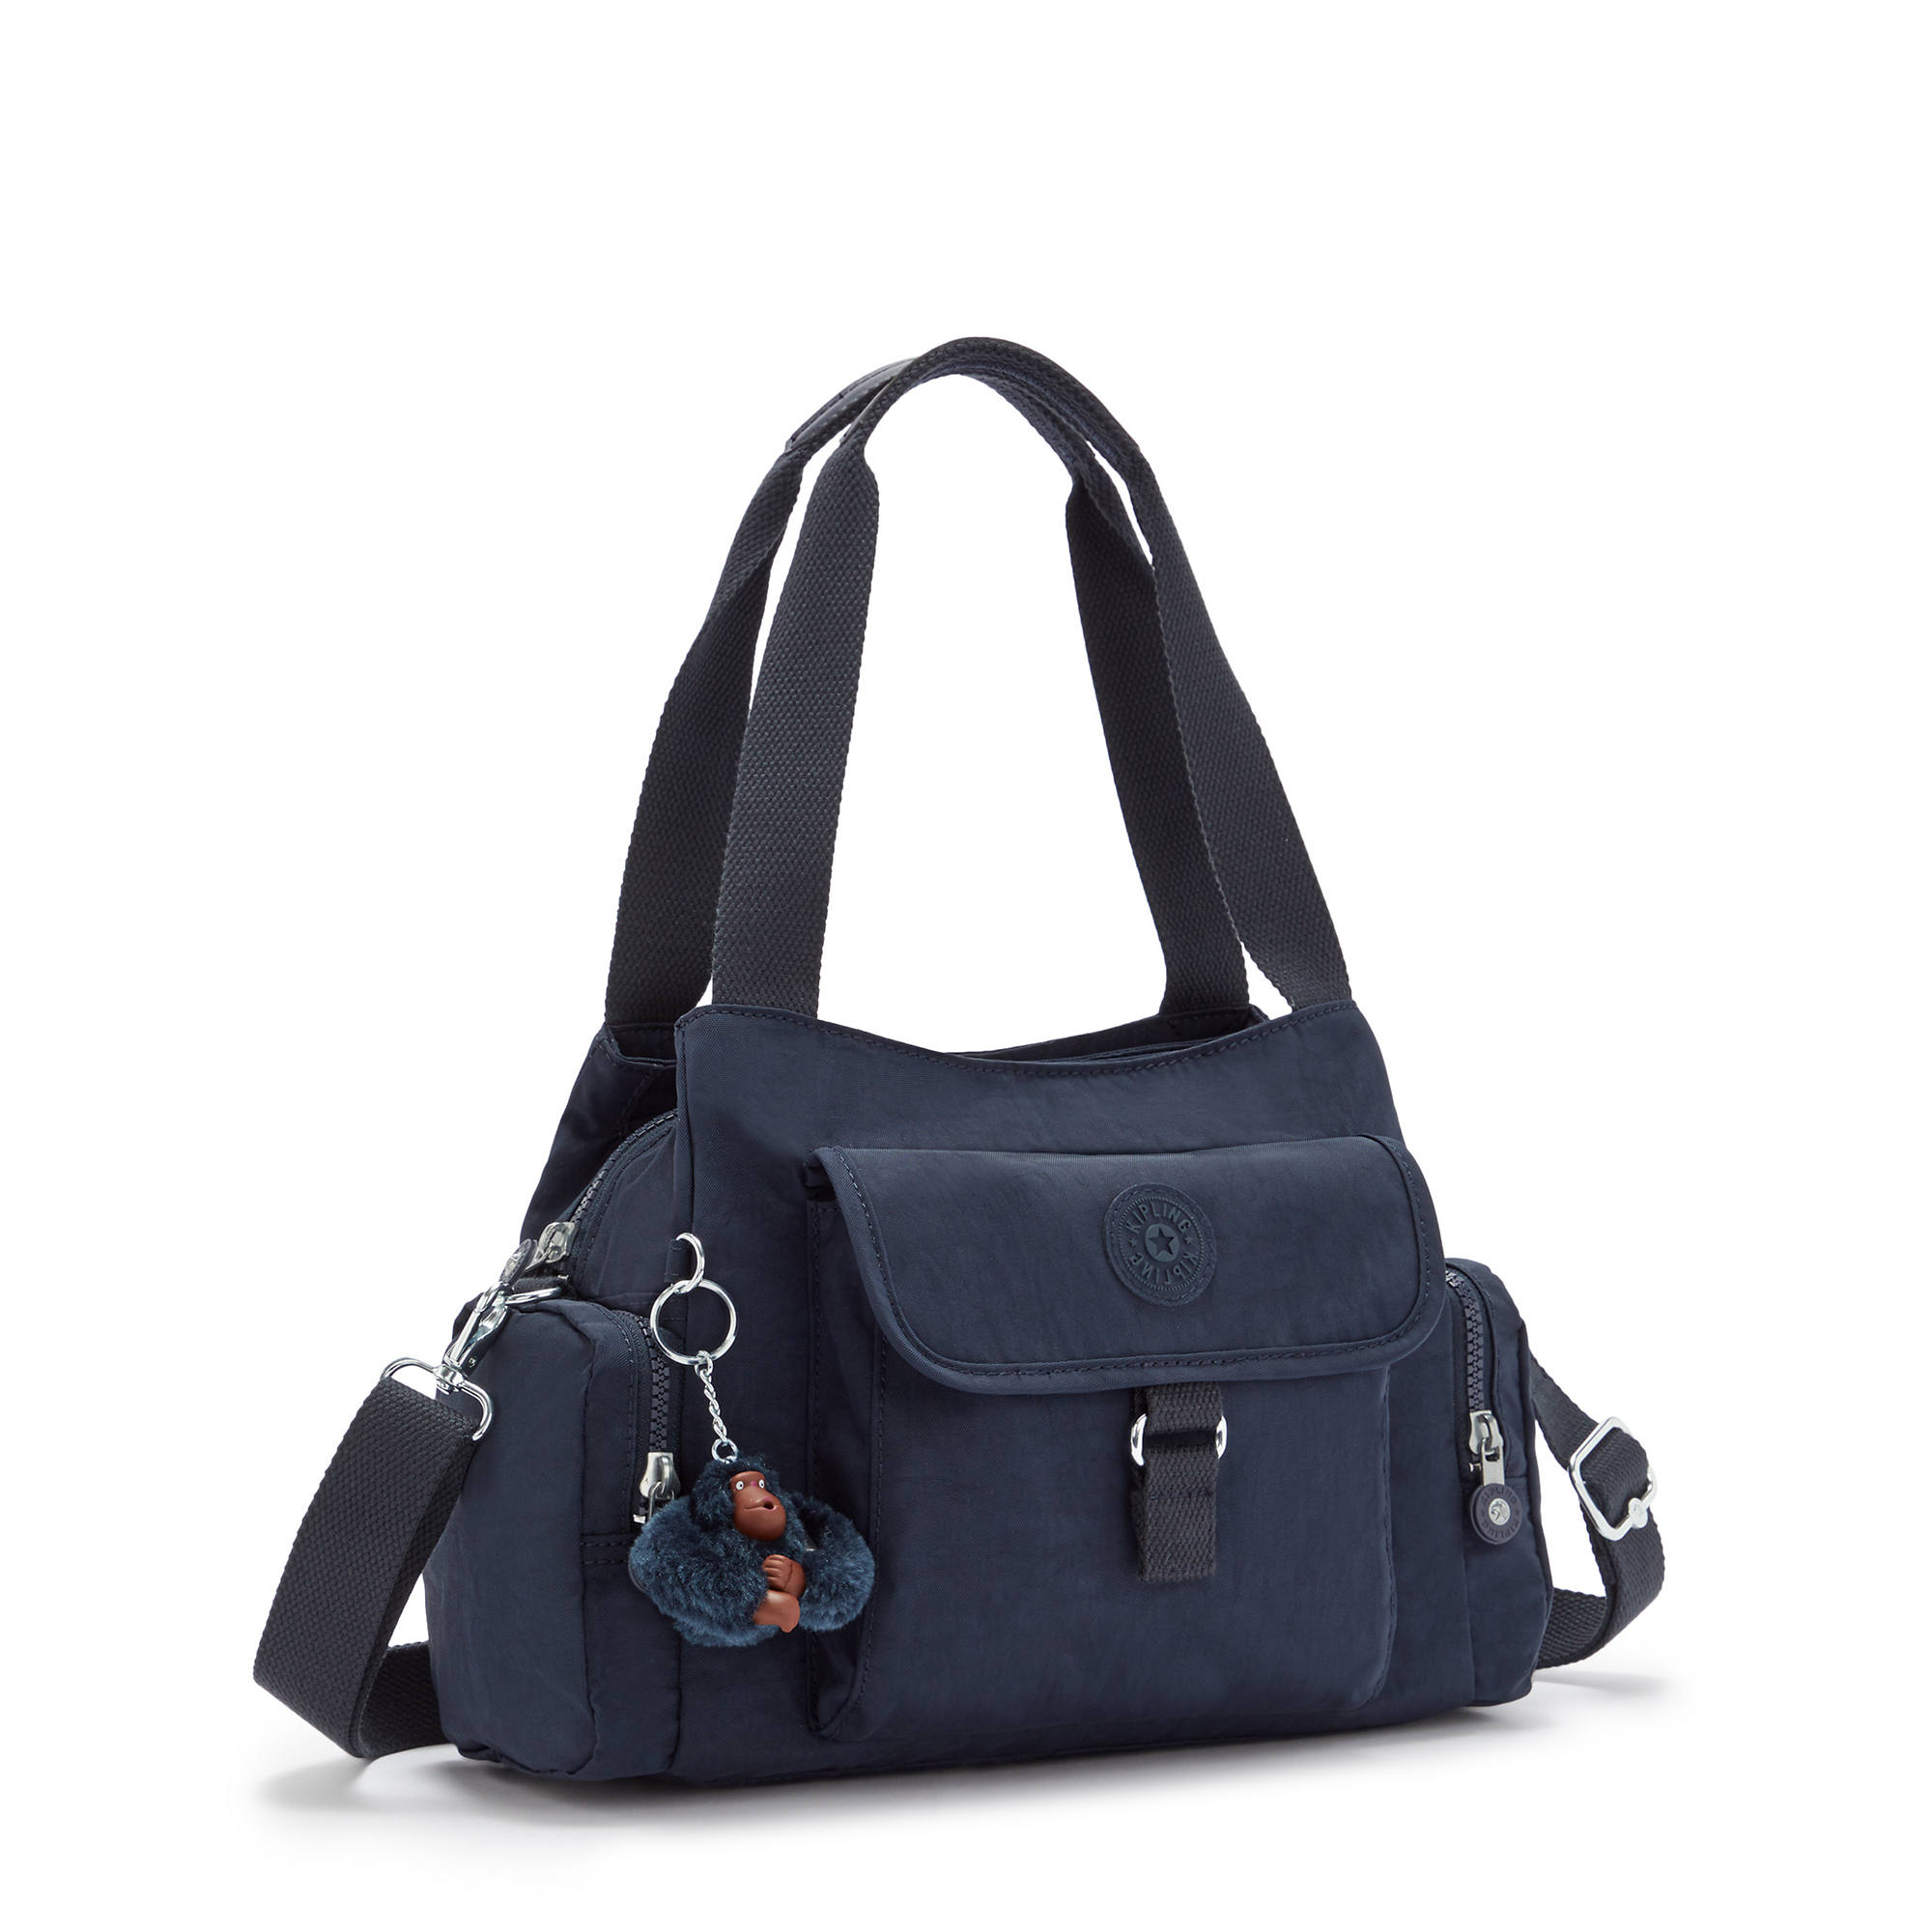 Kipling-Felix-Large-Handbag miniature 38